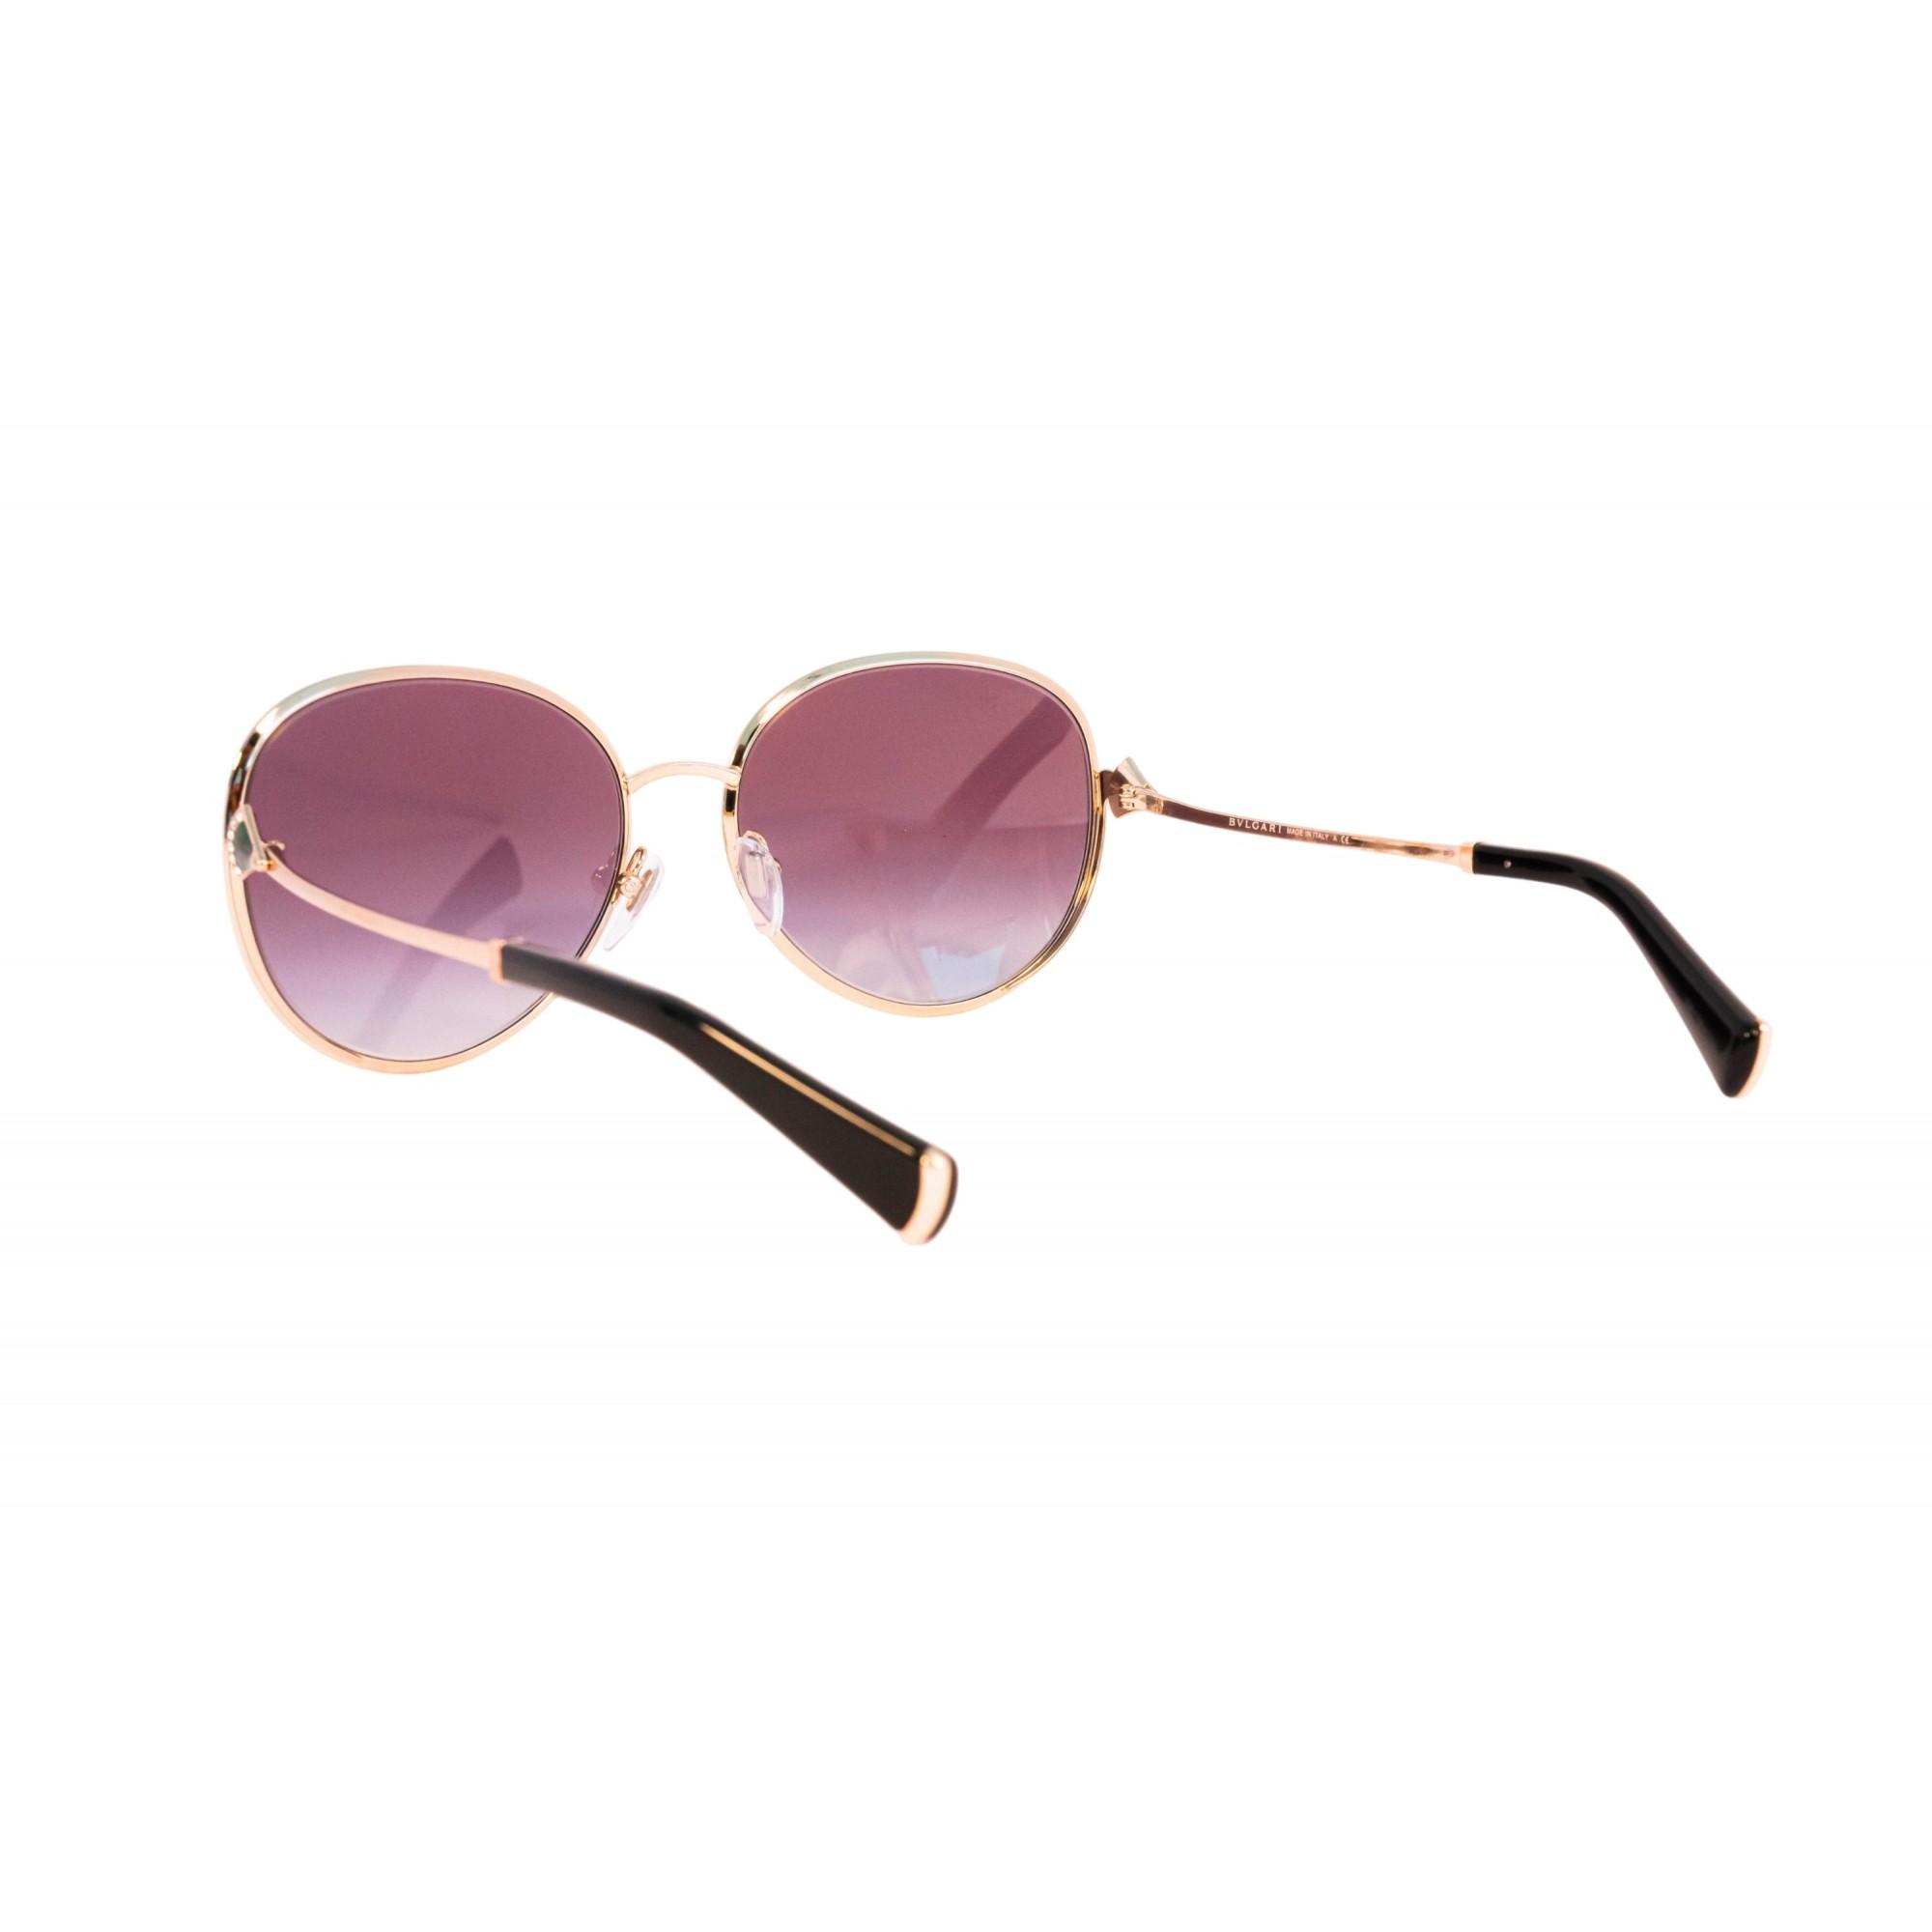 Óculos Bvlgari Clássico bv6106b 20338g 59 Dourado